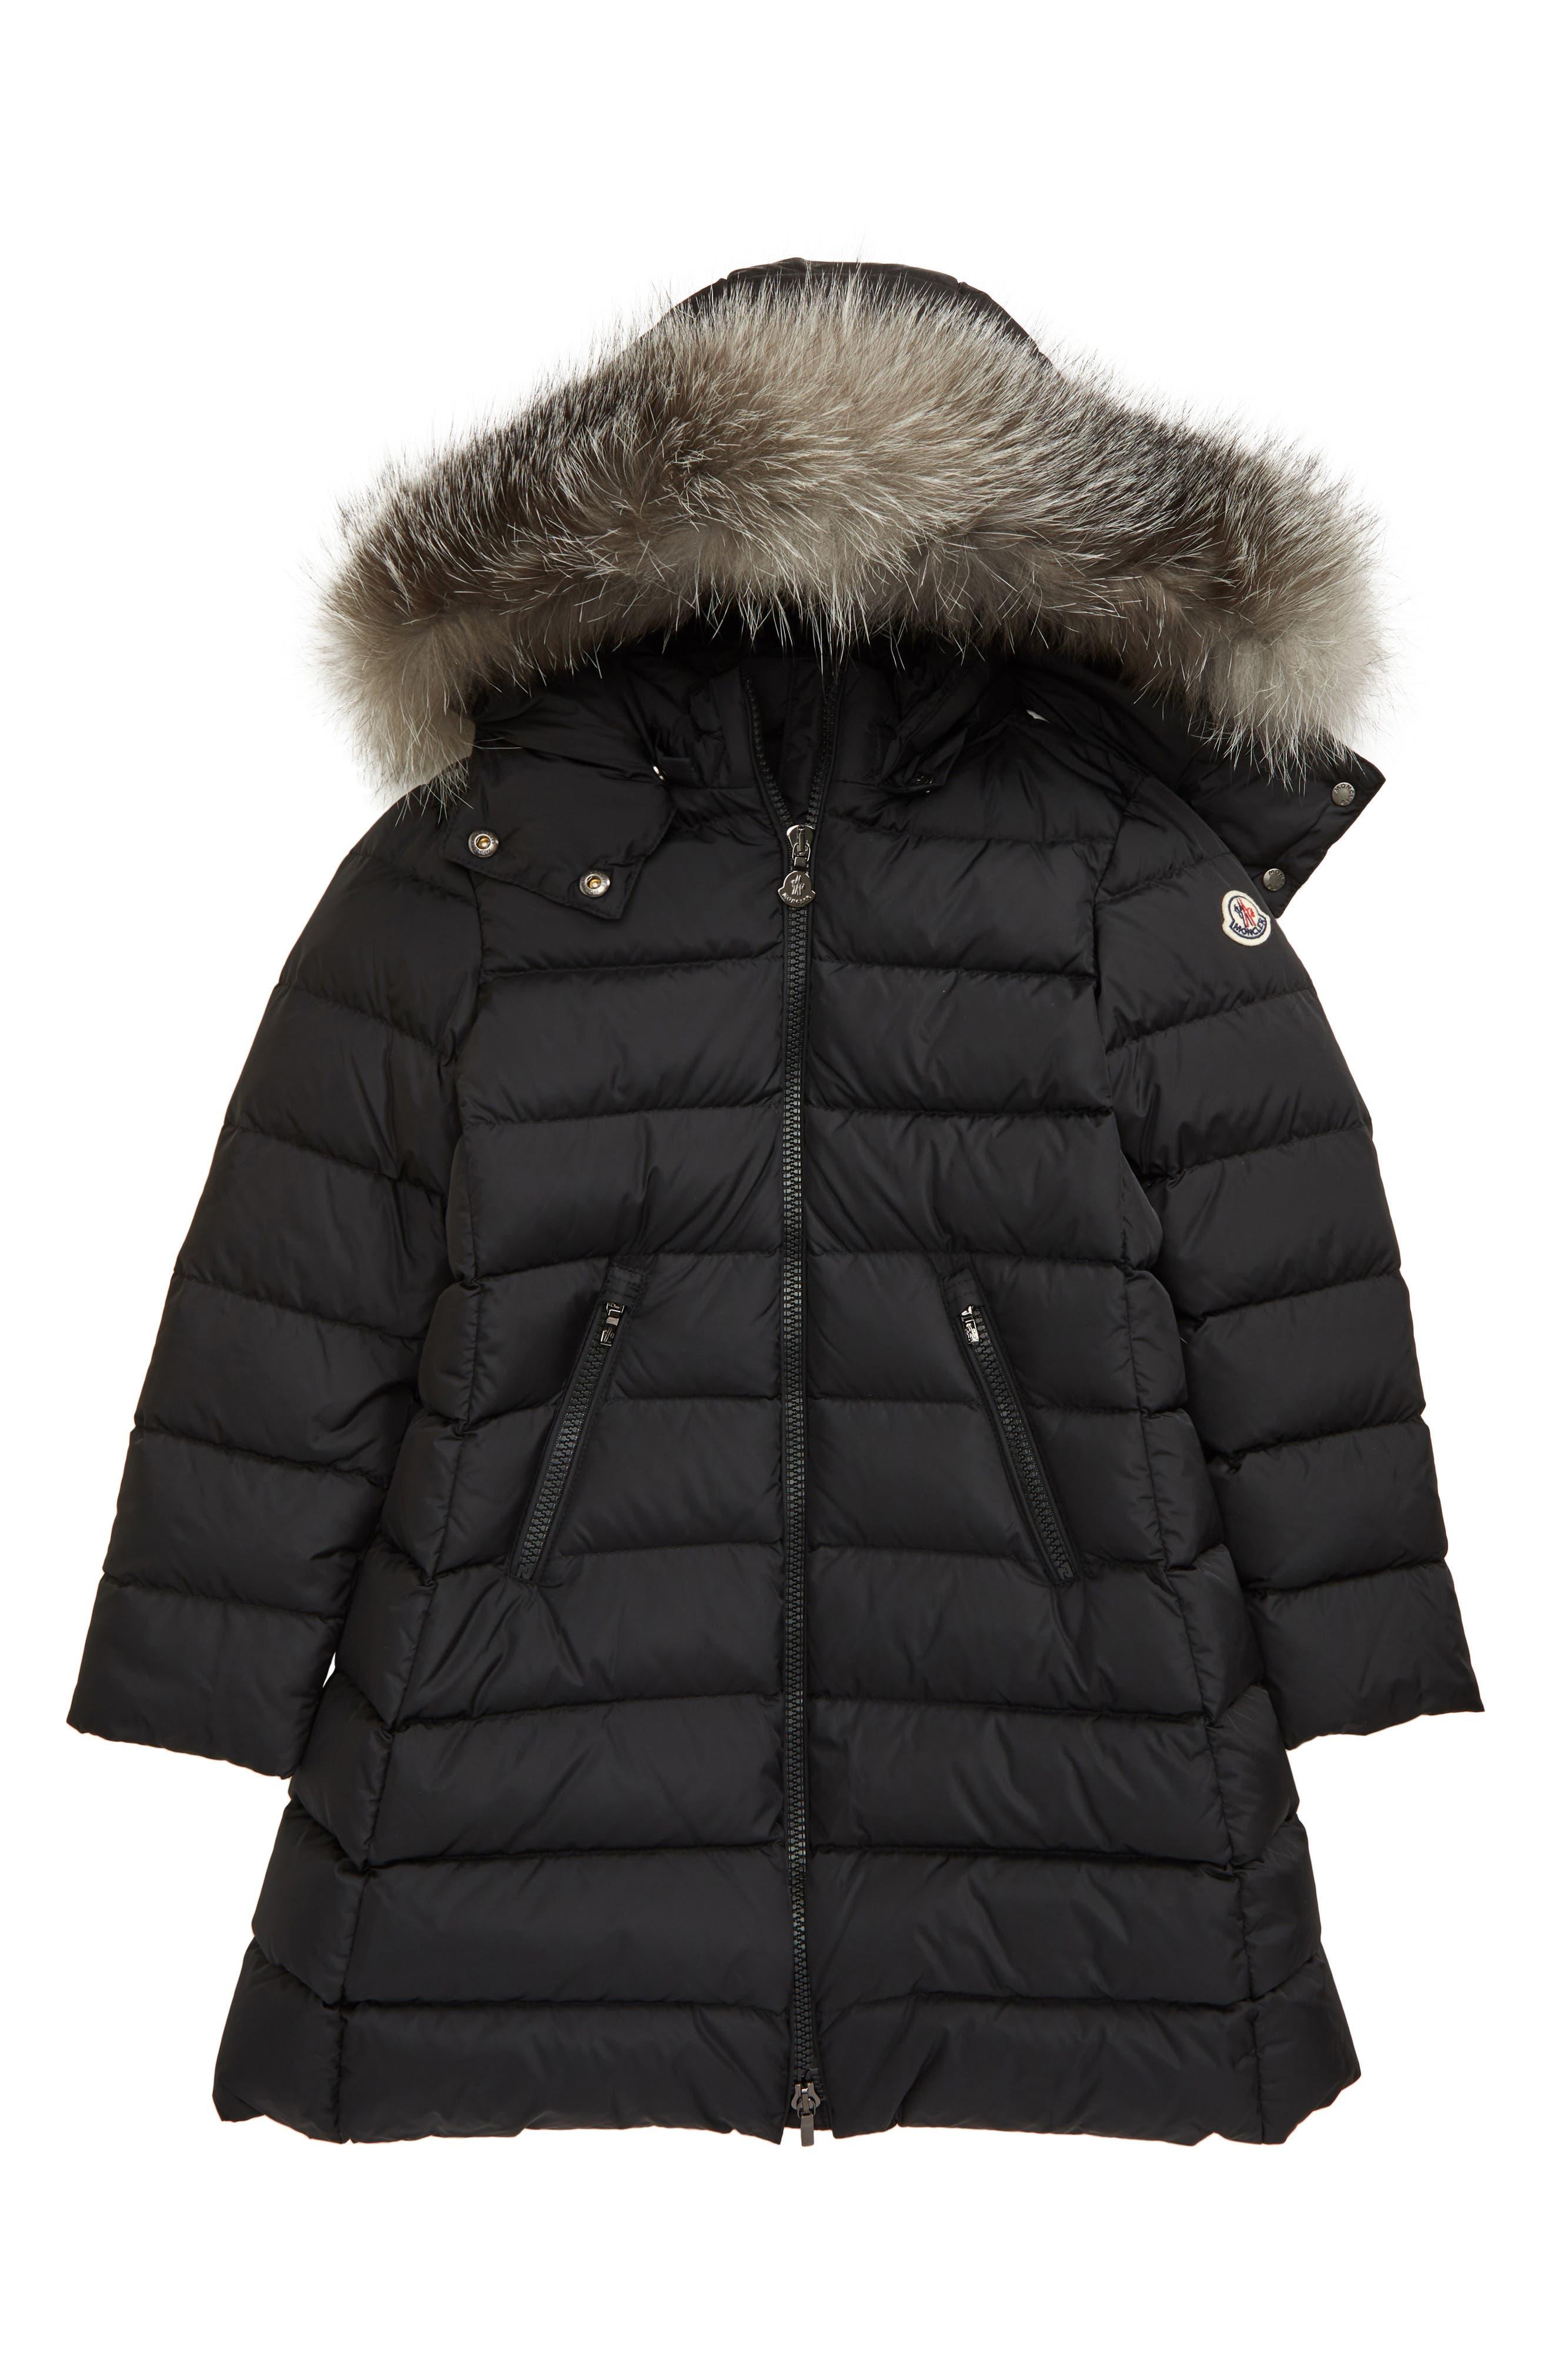 Kids Baby Hooded Down Jacket Boys Girls Winter Puffer Coat Snowsuit Windproof Padded Jacket Cotton Outerwear